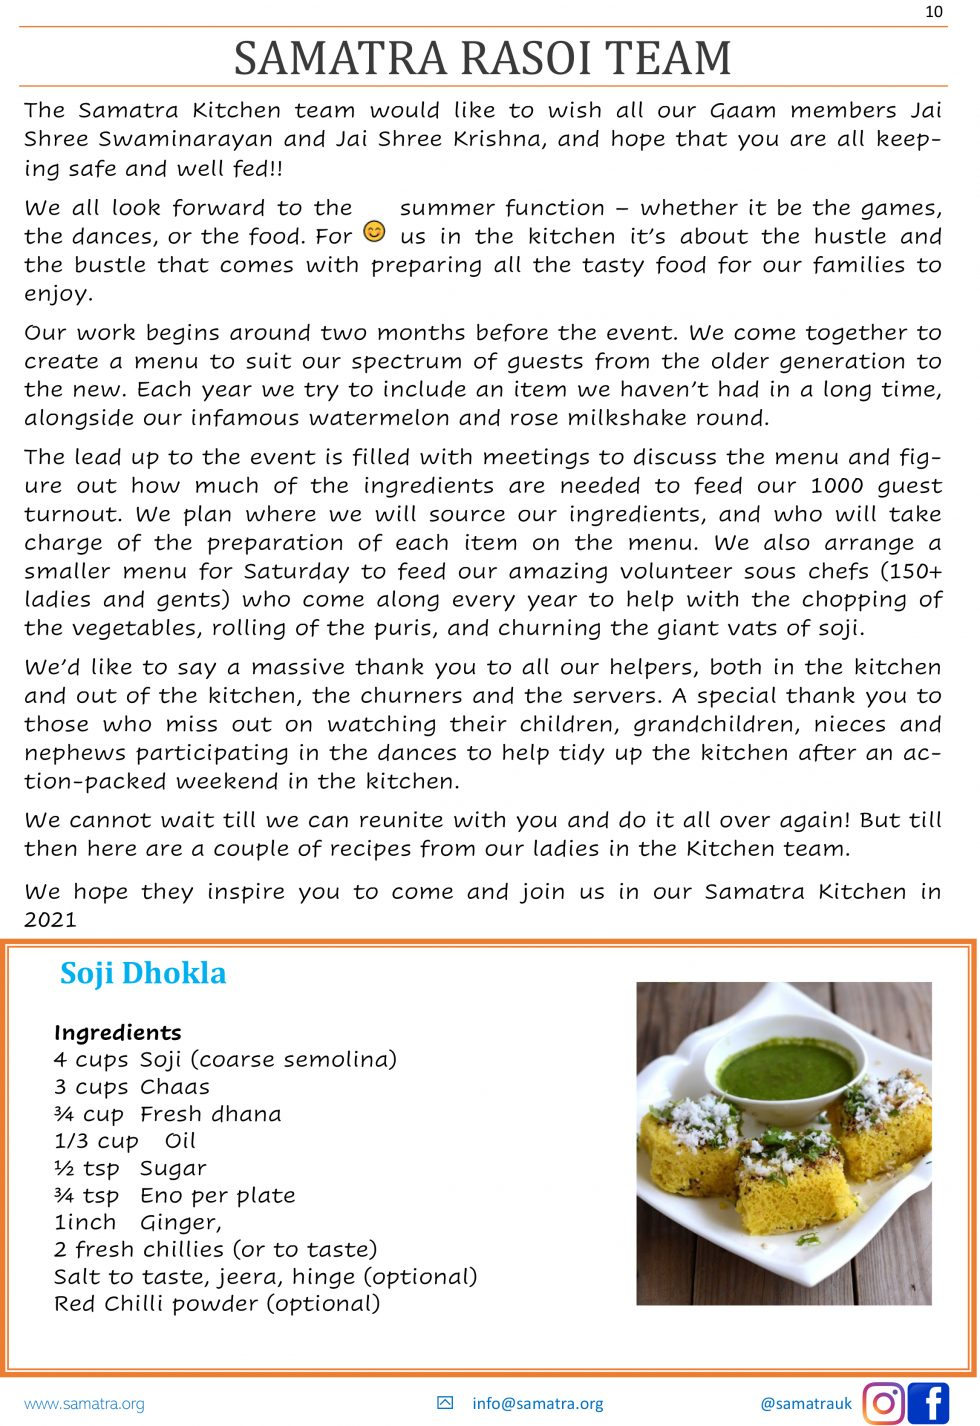 Samatra Newsletter - 10